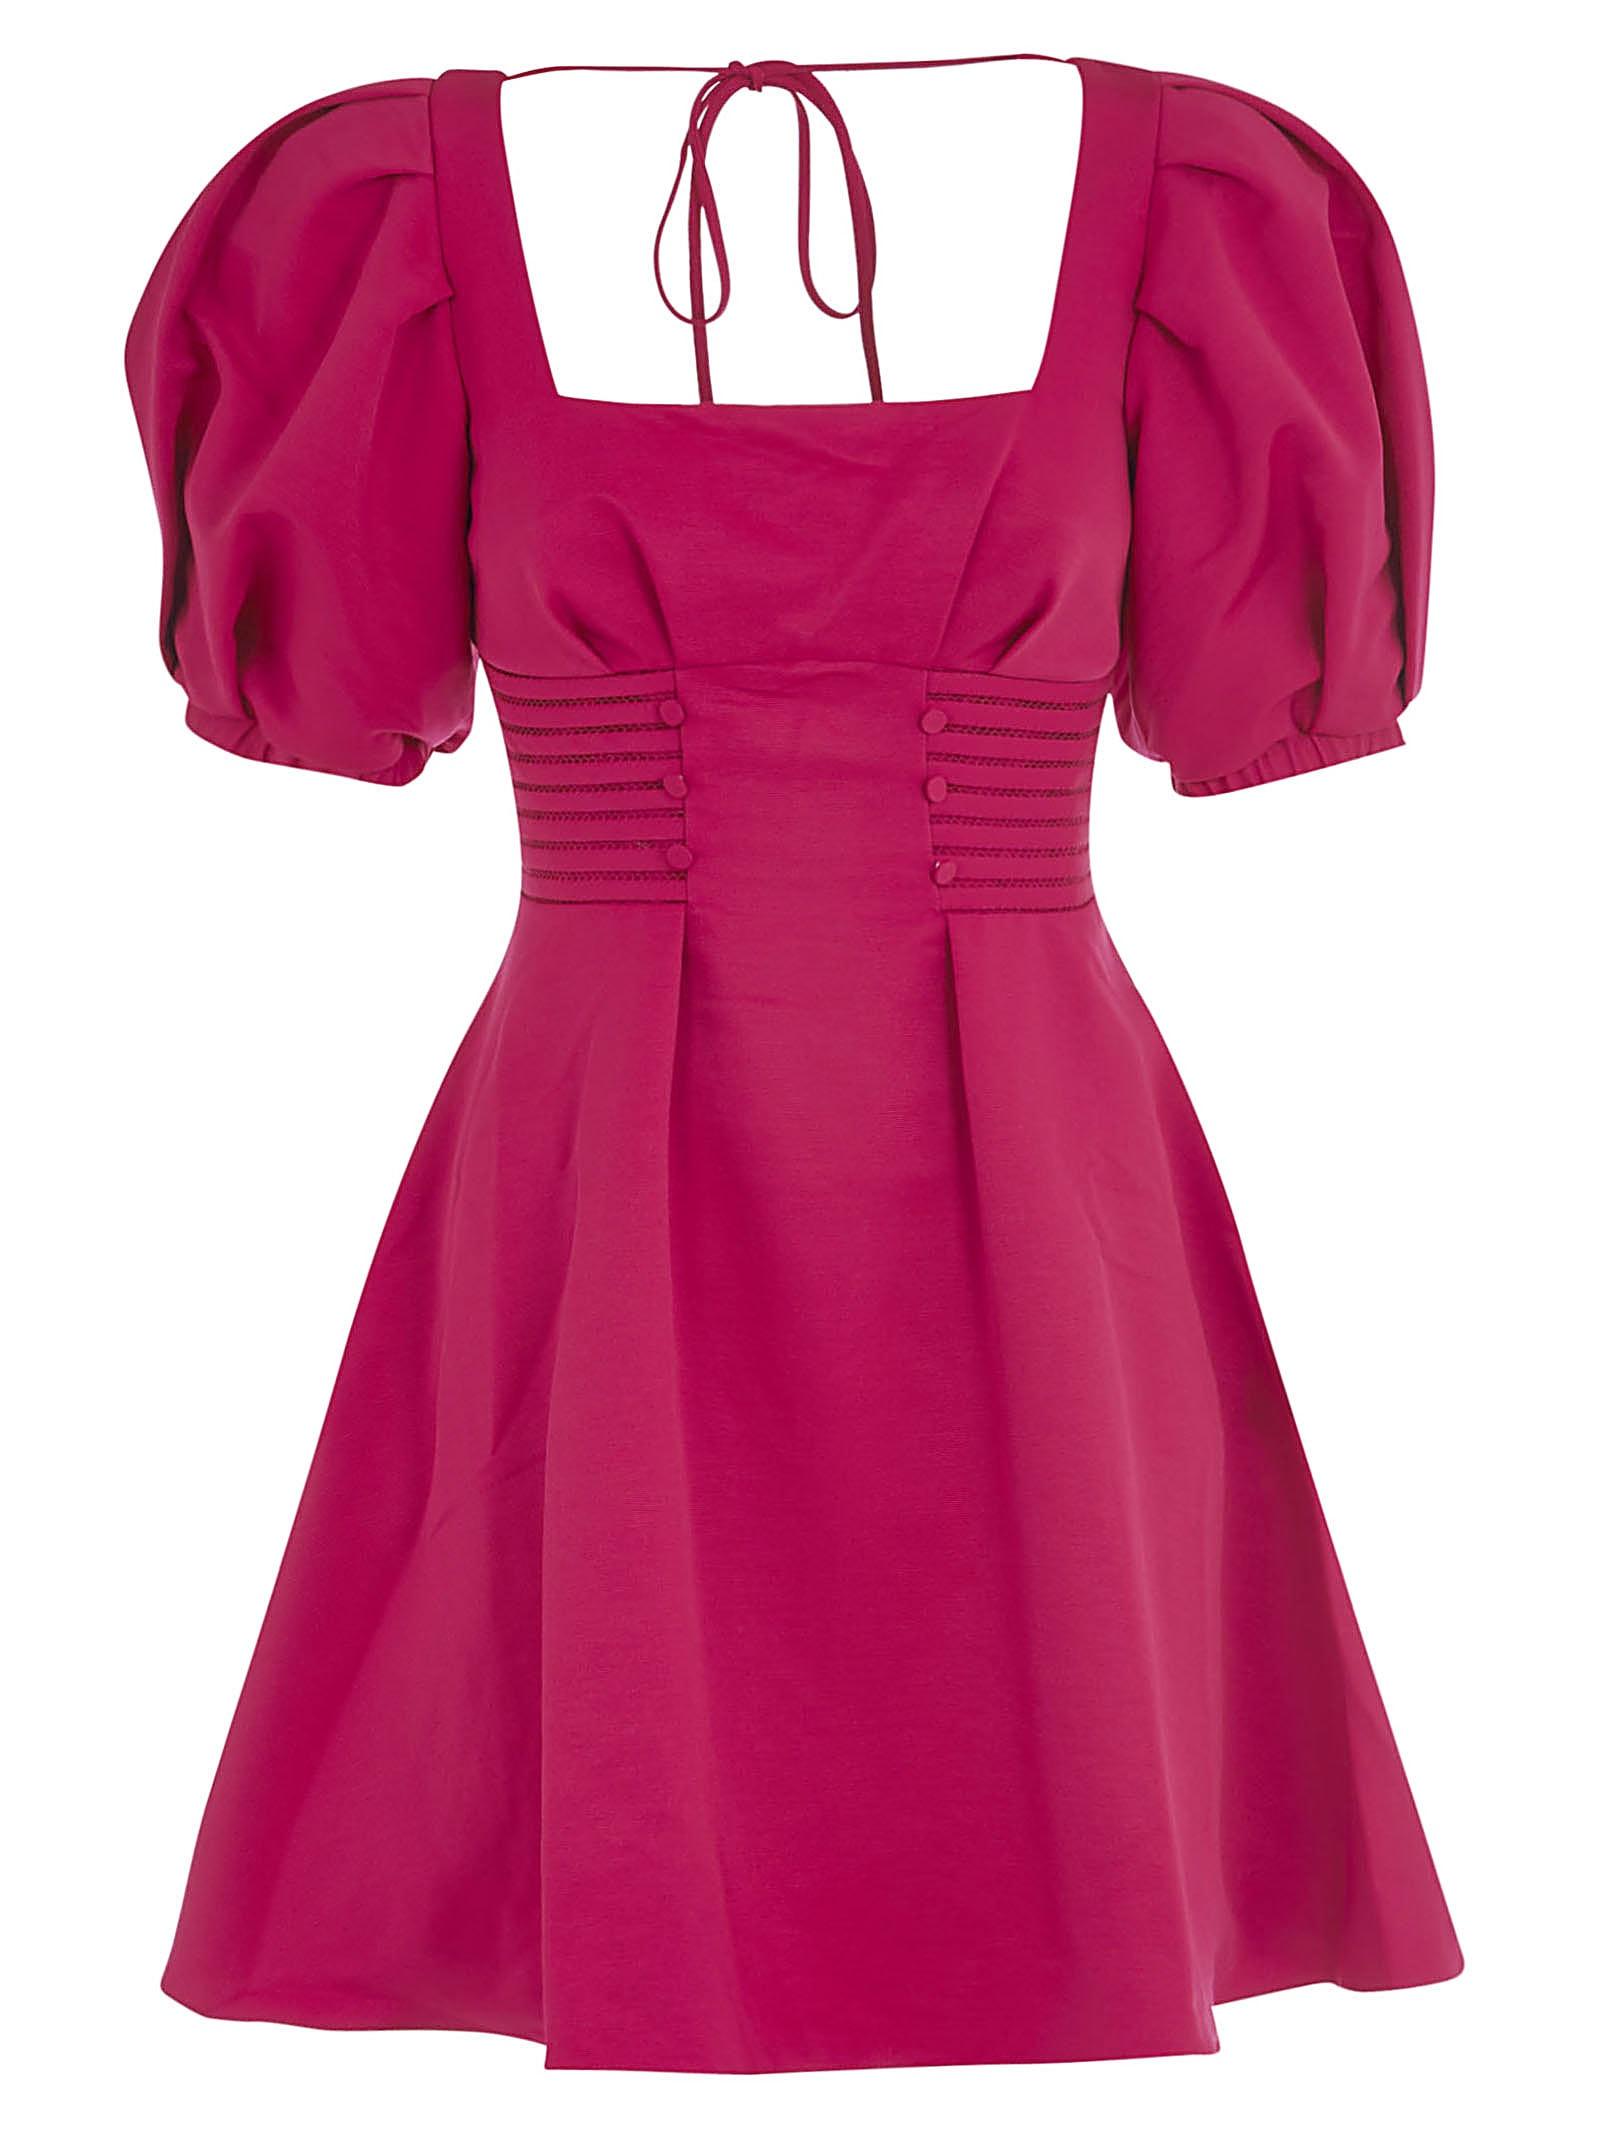 Buy self-portrait Fuchsia Ottoman Square Neck Mini Dress online, shop self-portrait with free shipping